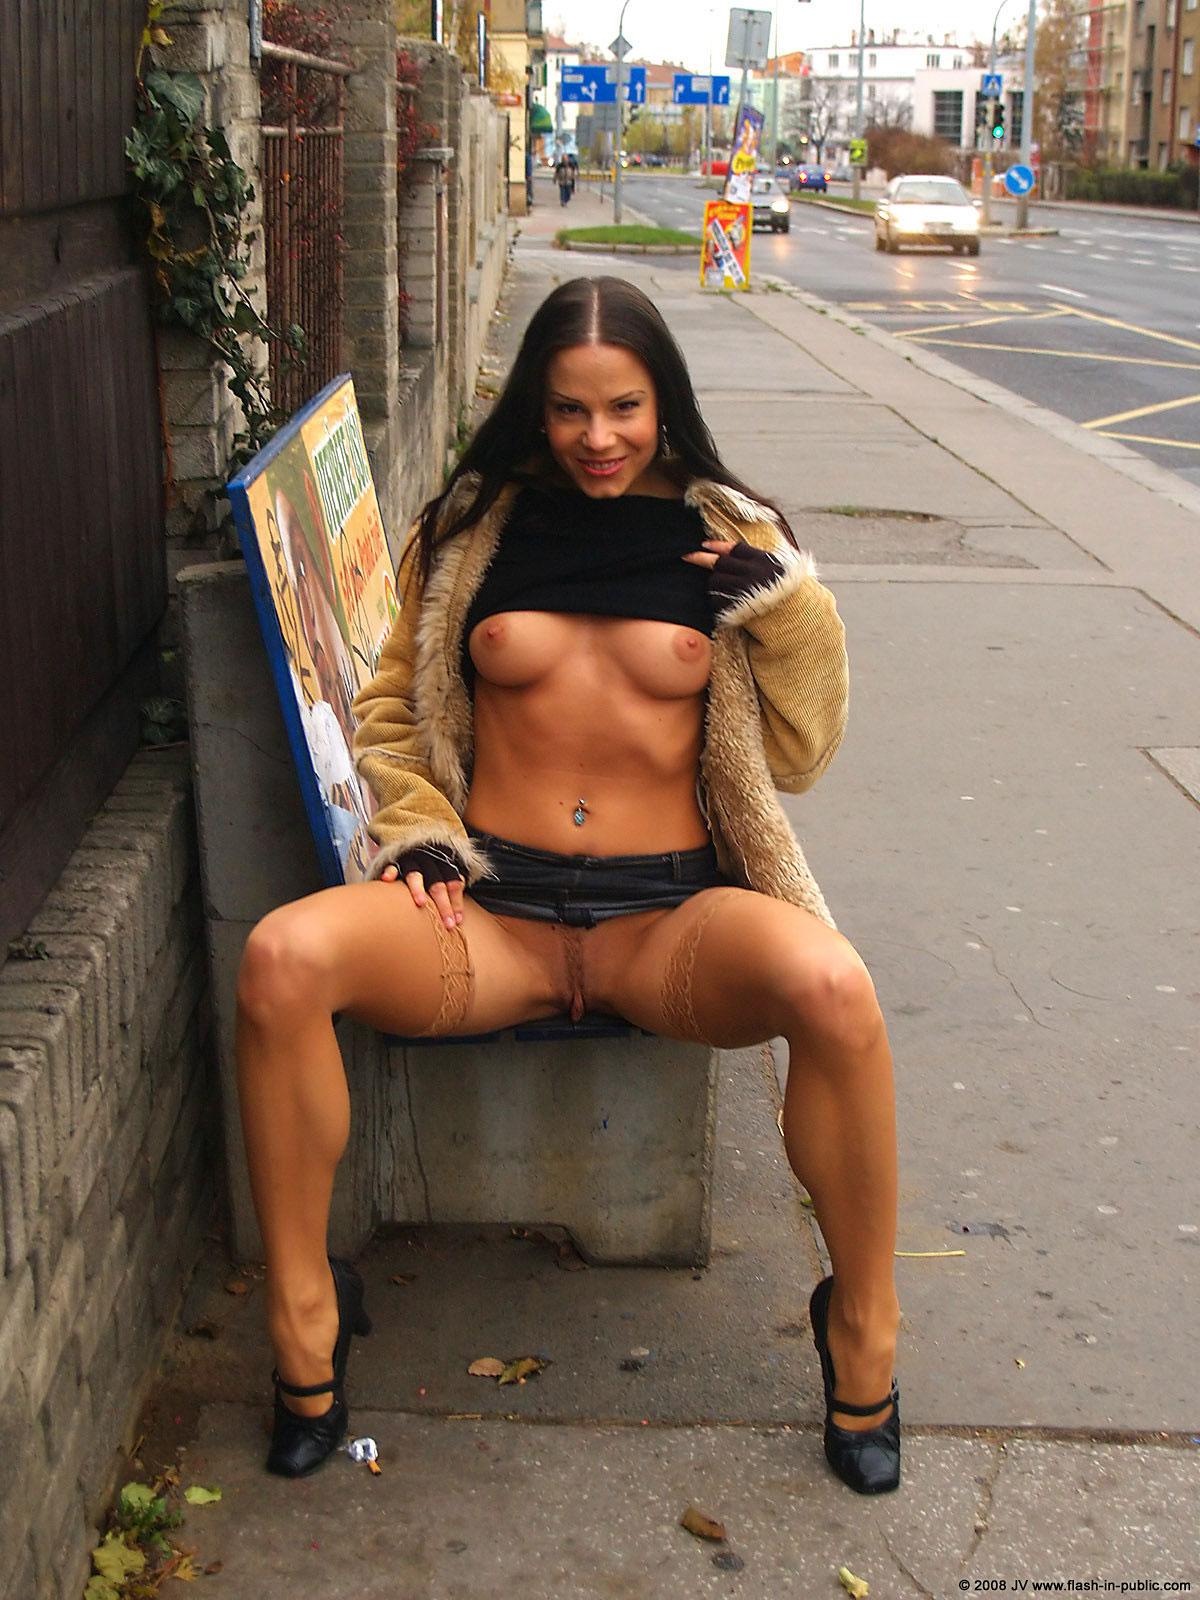 alexandra-g-bottomless-stockings-flash-in-public-02